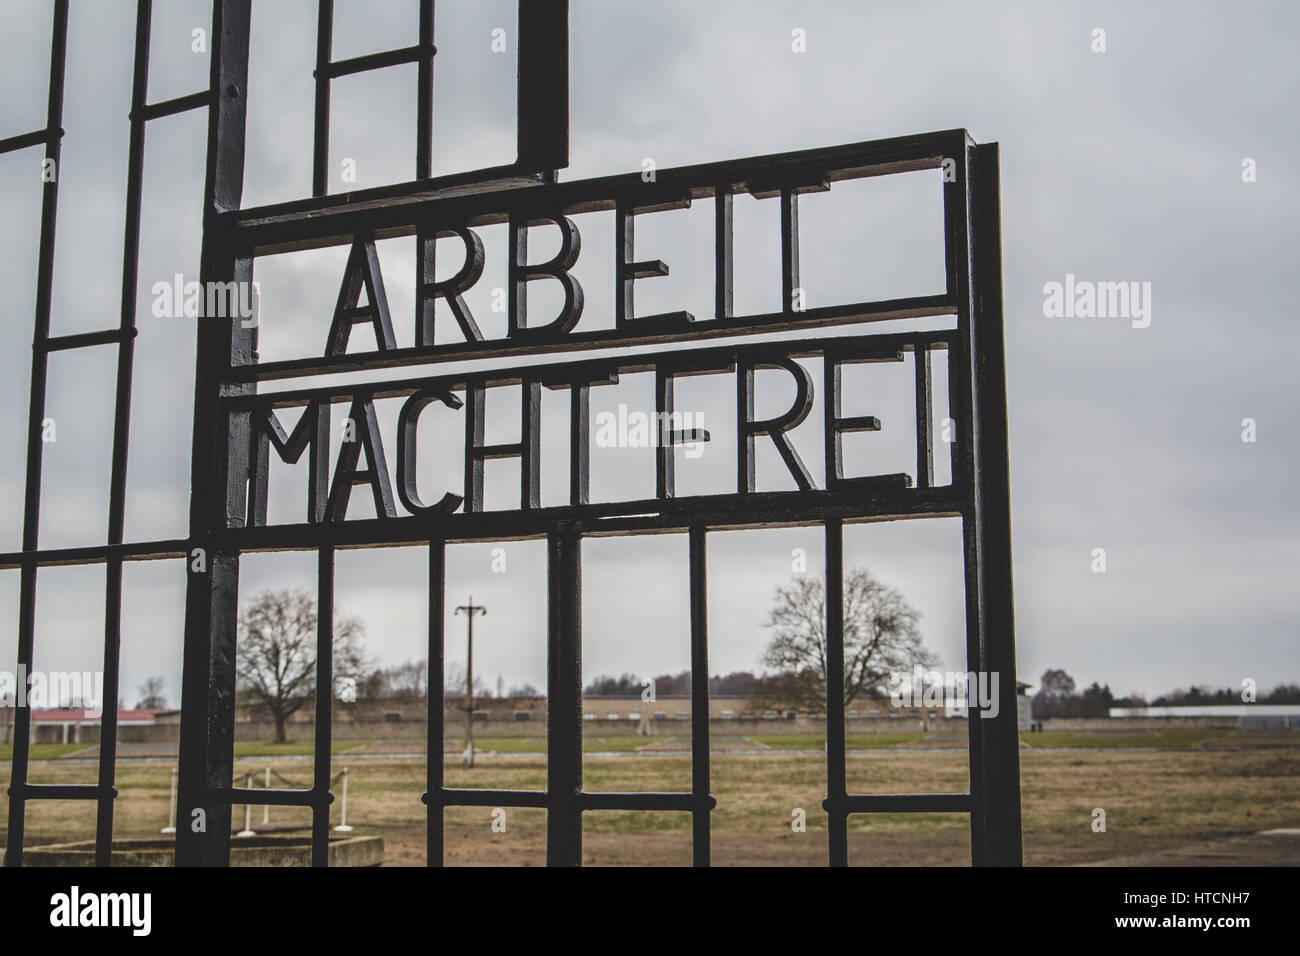 Arbeit Macht Frei gate at Sachsenhausen concentration camp memorial site, Oranienburg, Germany - Stock Image